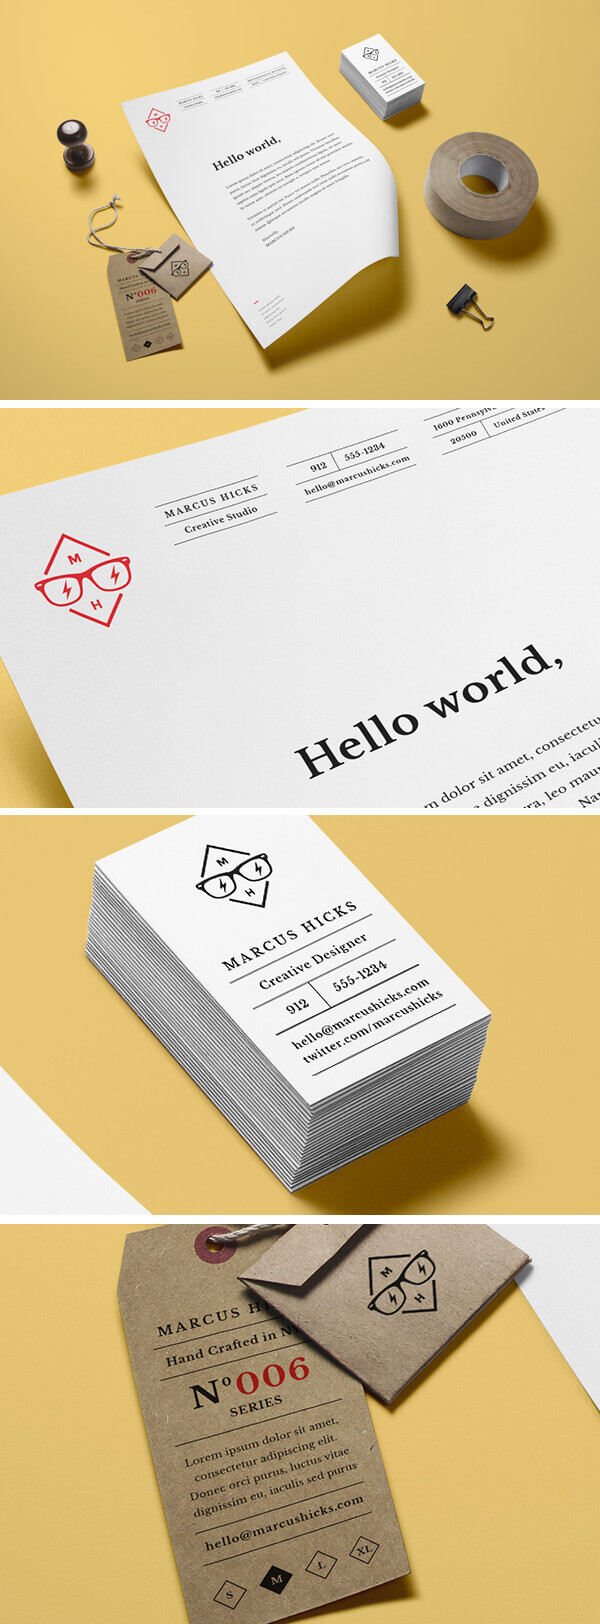 Branding : Identity MockUp Vol.14